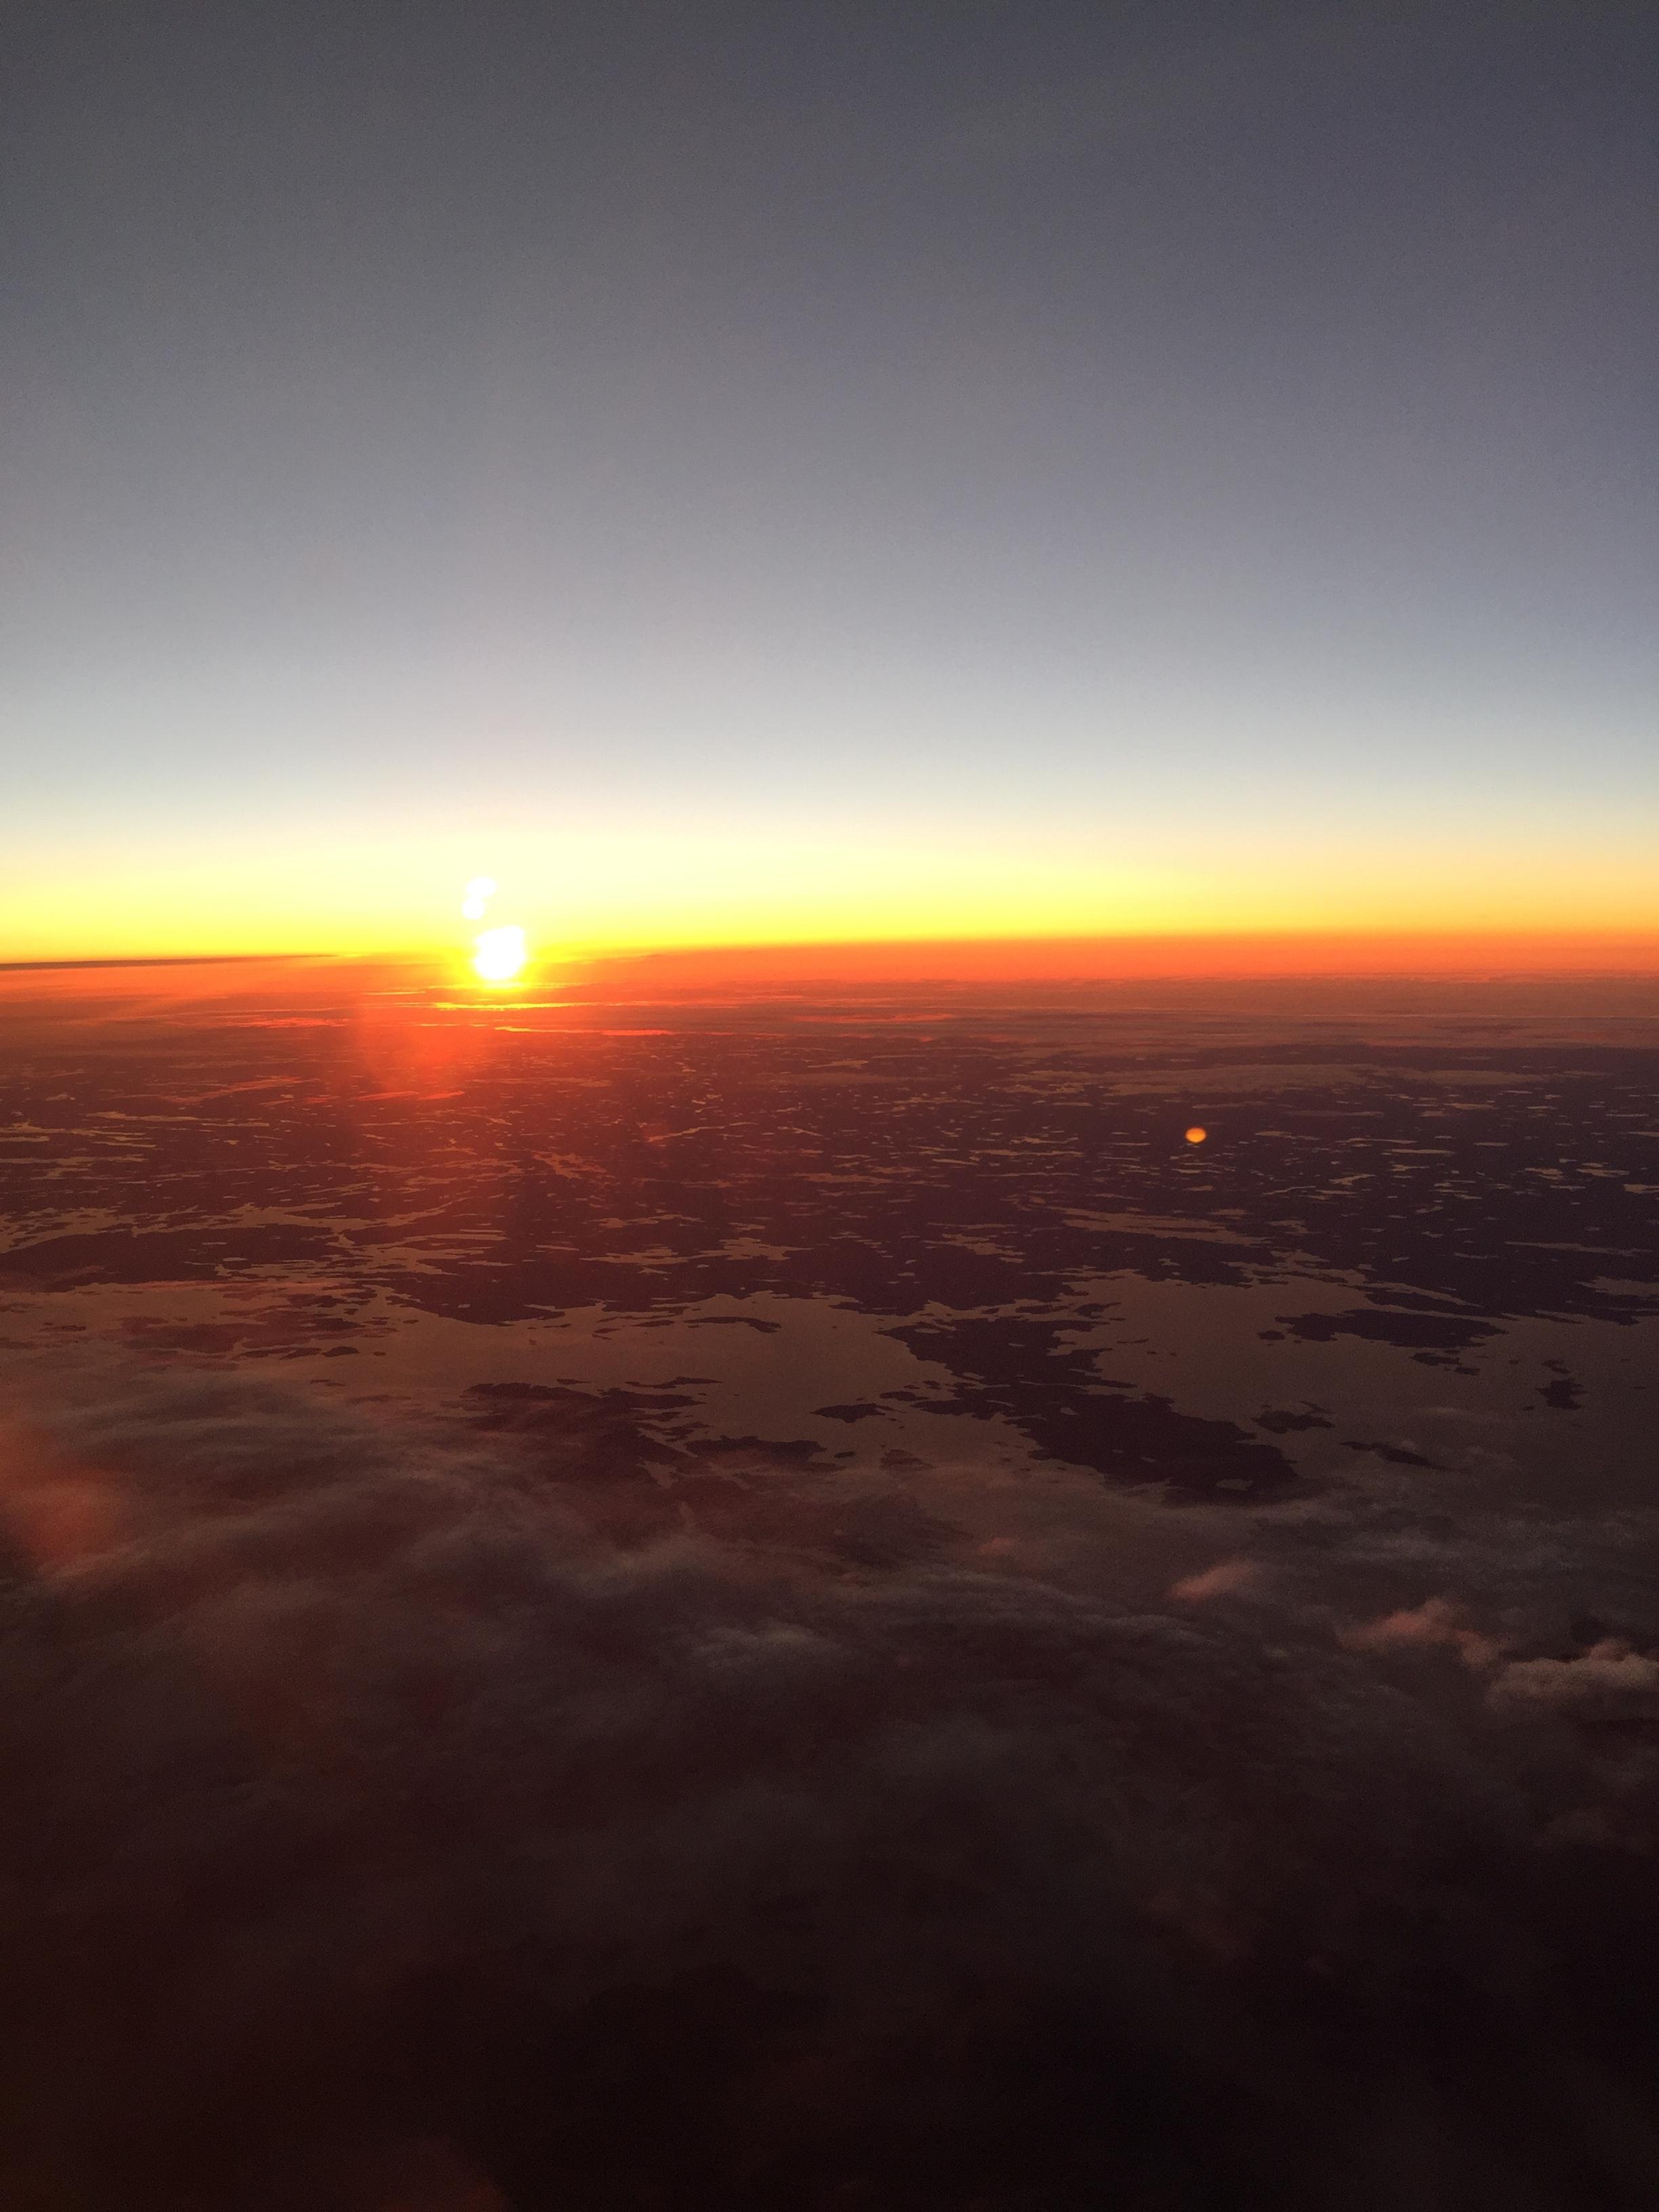 Sunrise on the way to Paris